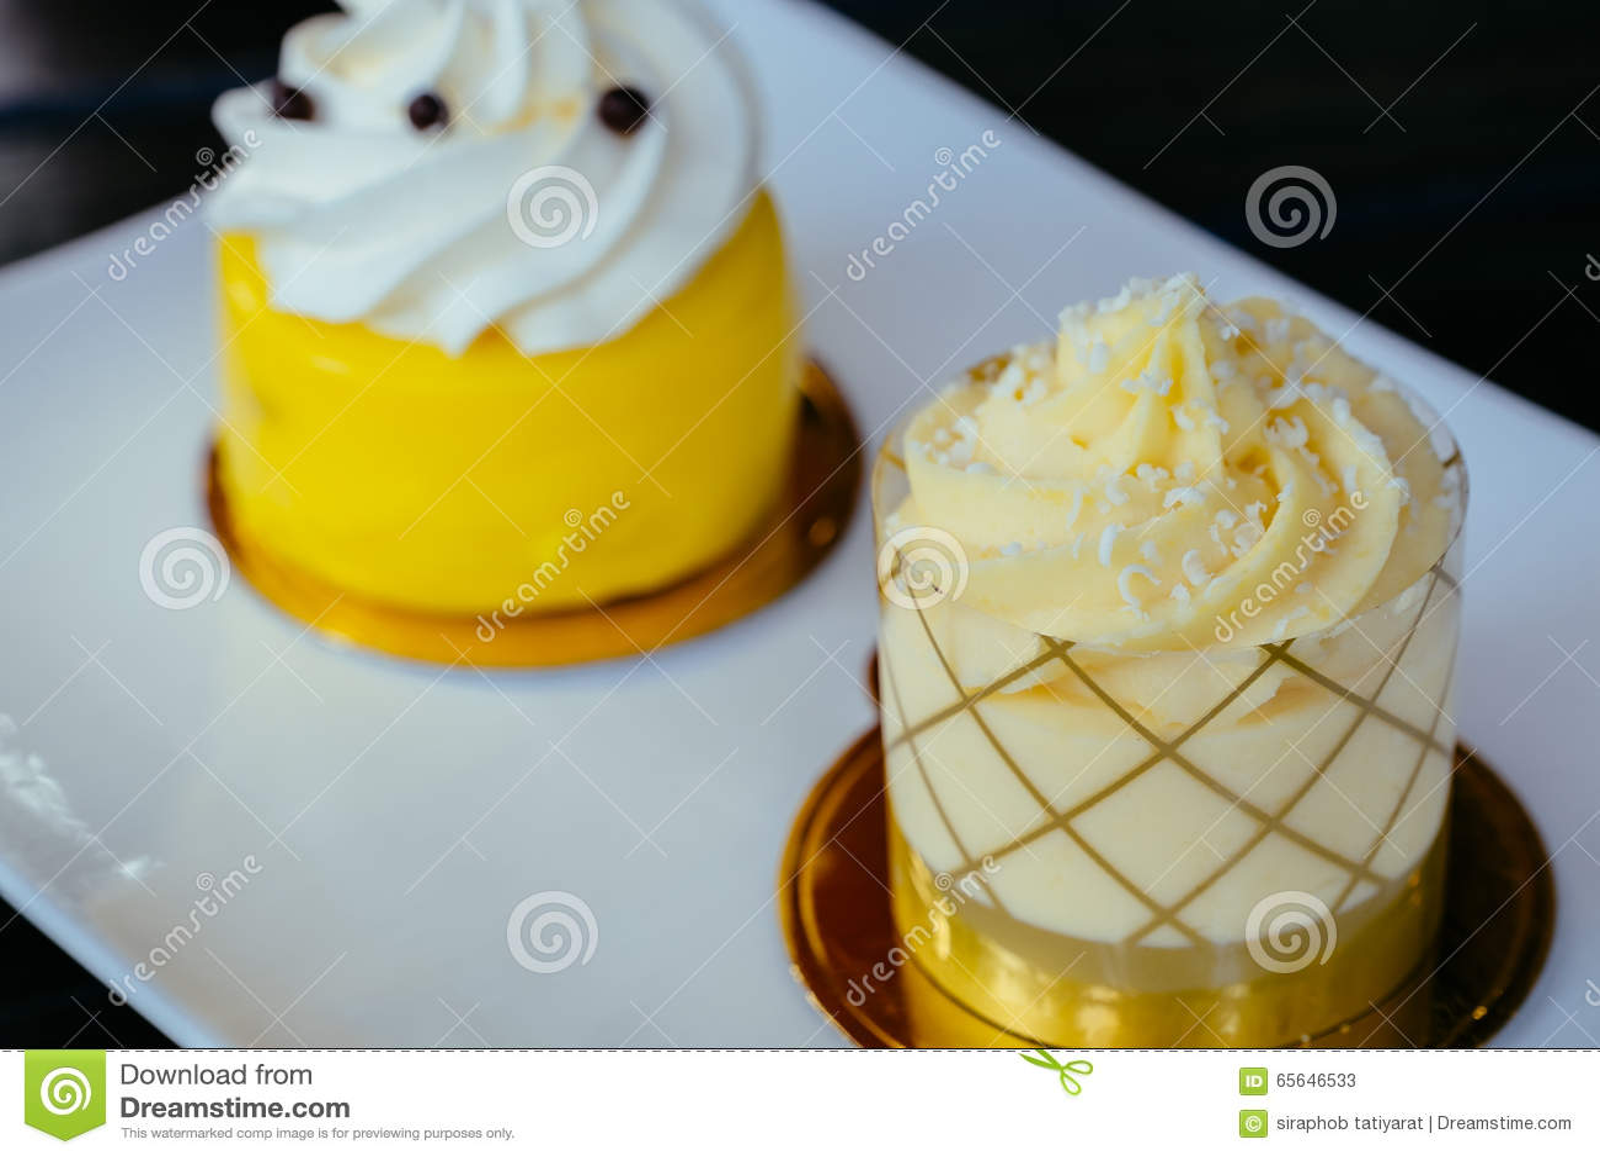 Gâteau de citron